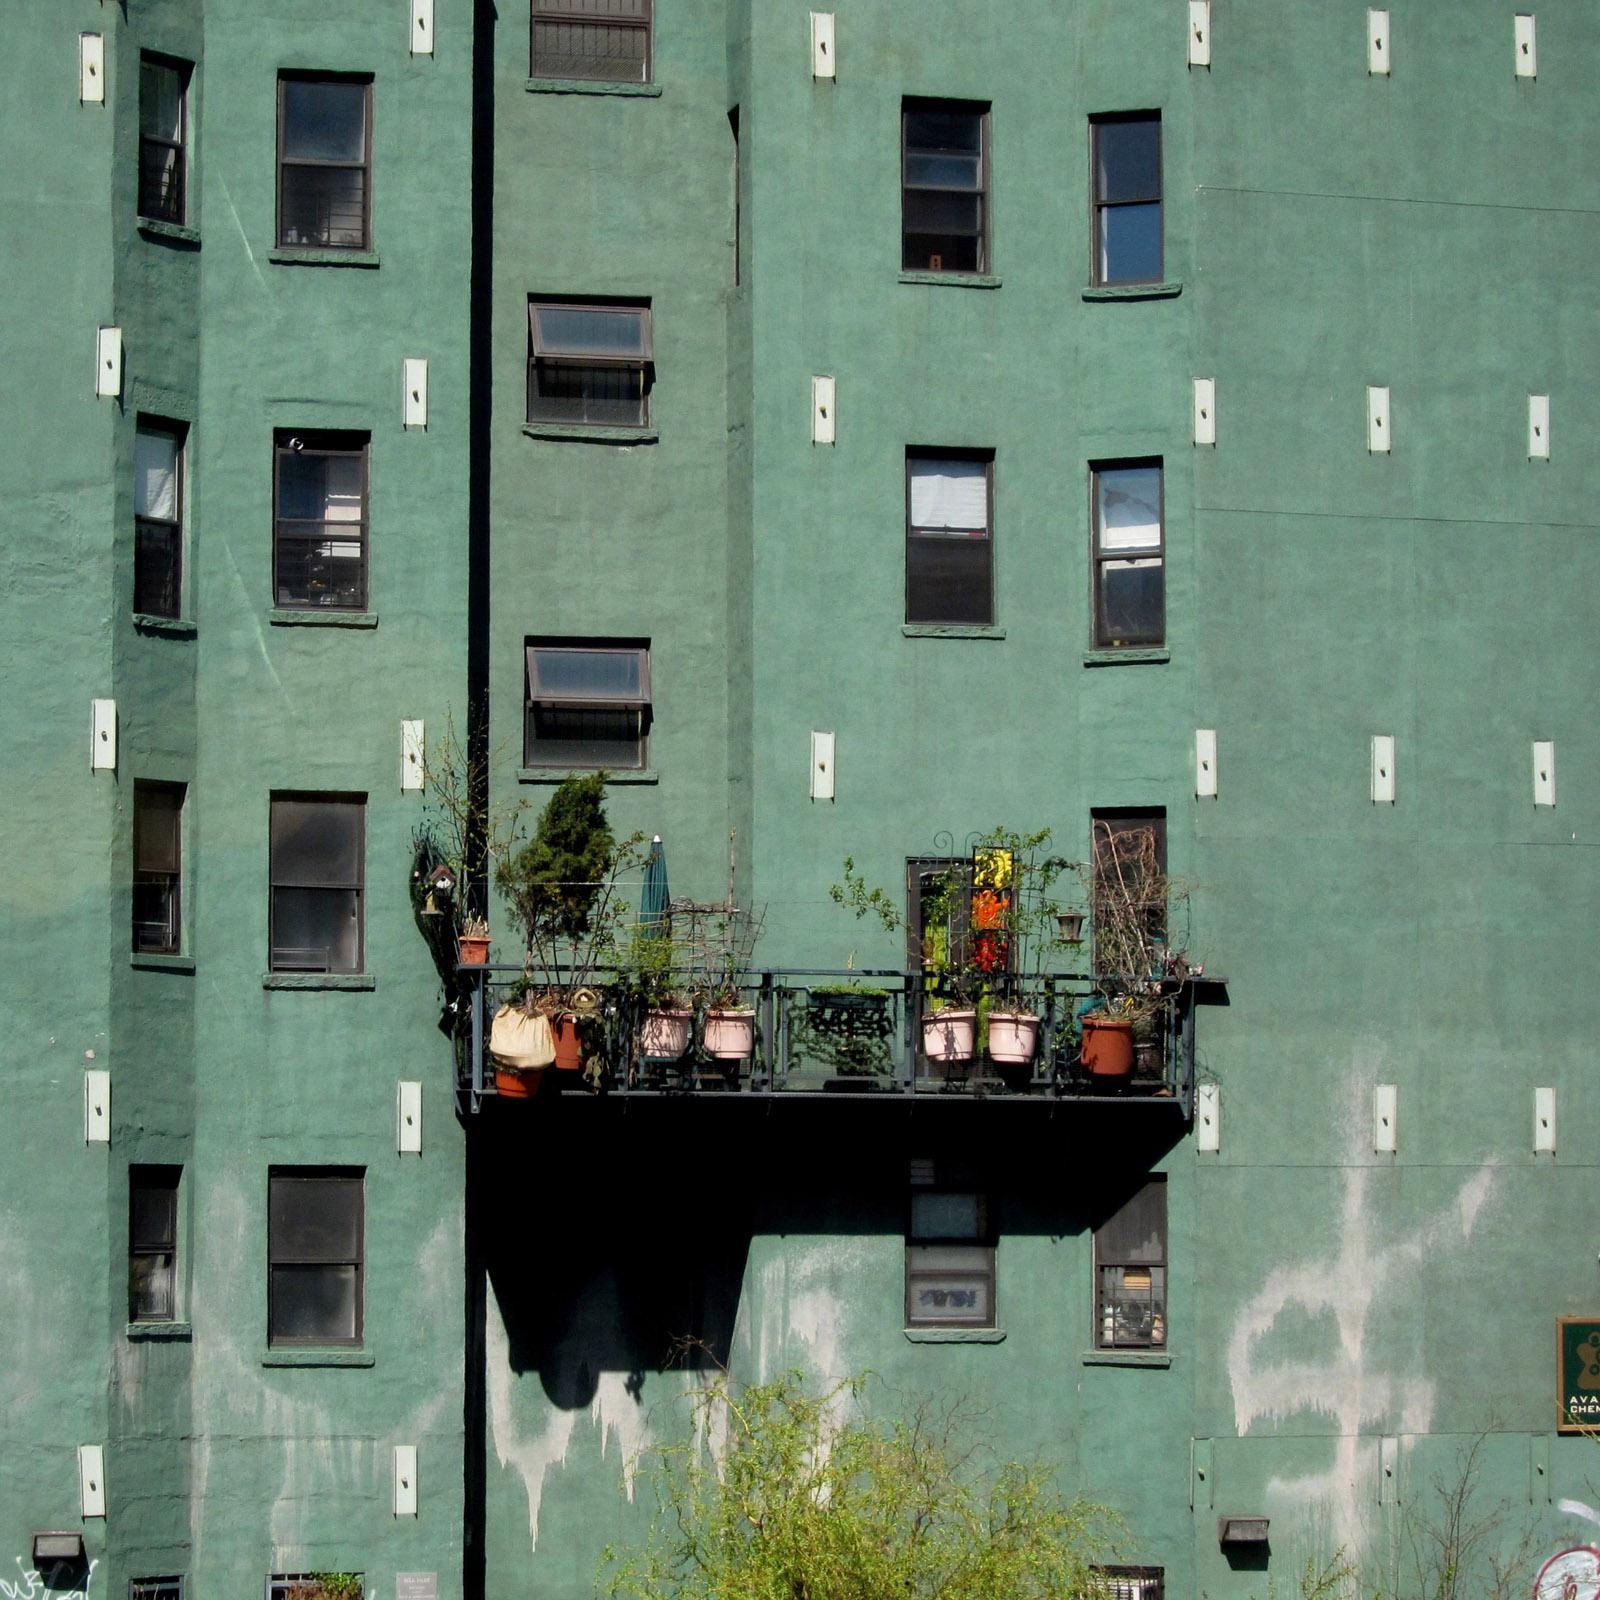 <i>Green Wall, NYC</i> shot by Loren Madsen in New York, New York.